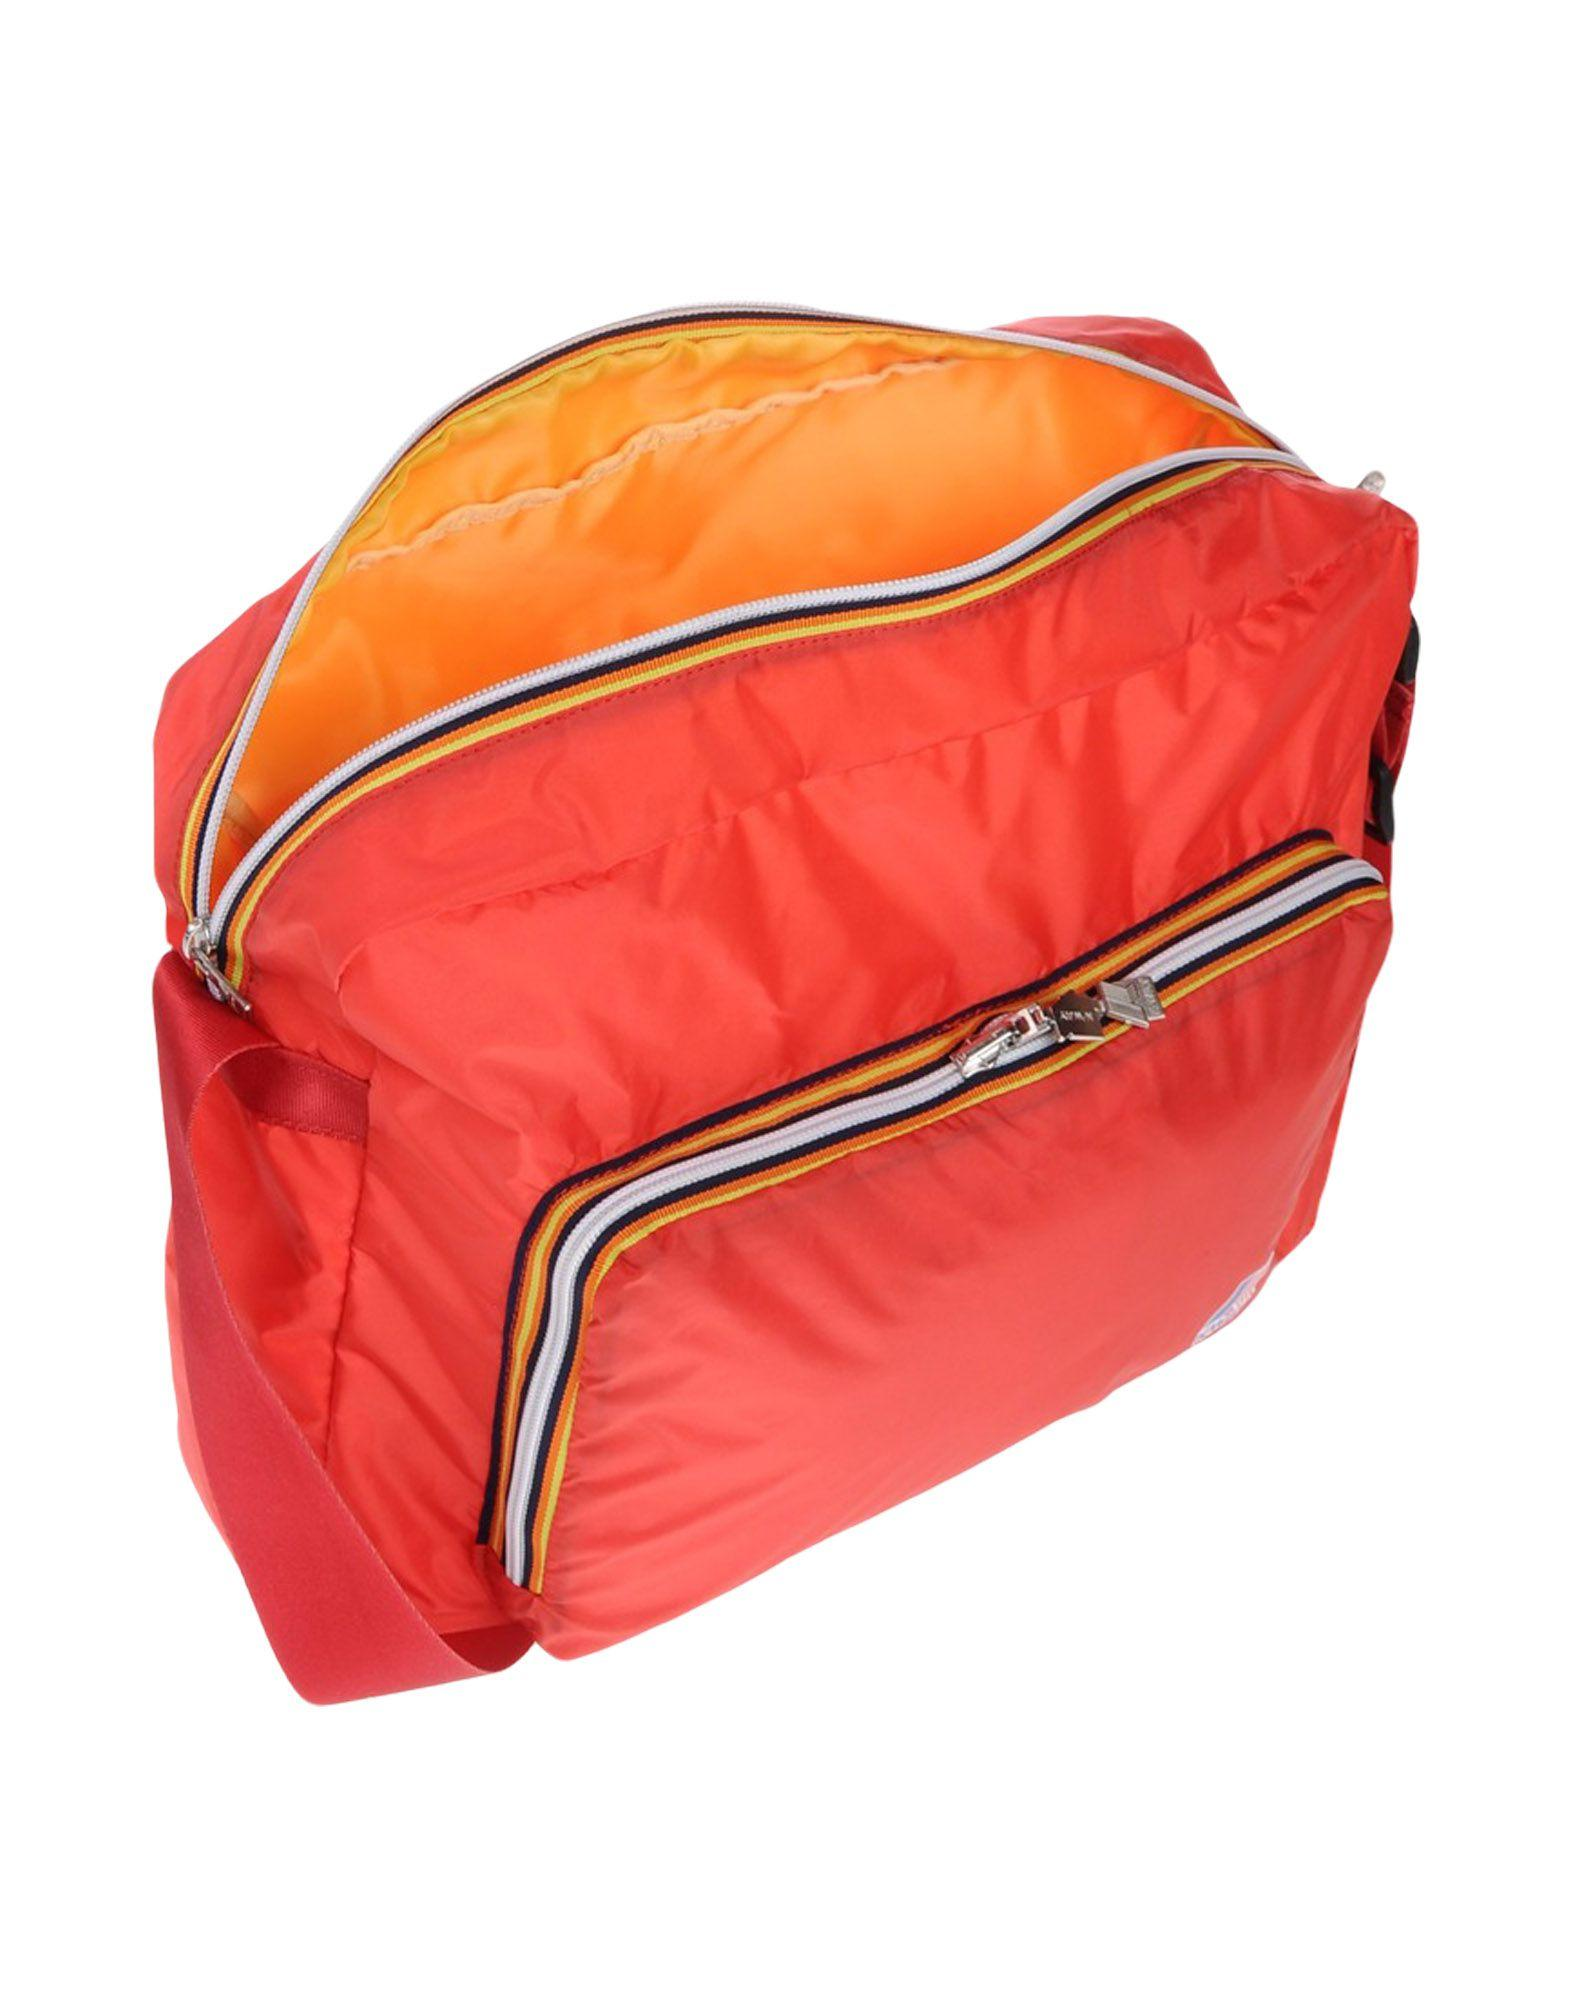 K-Way Cross-body Bag in Red for Men